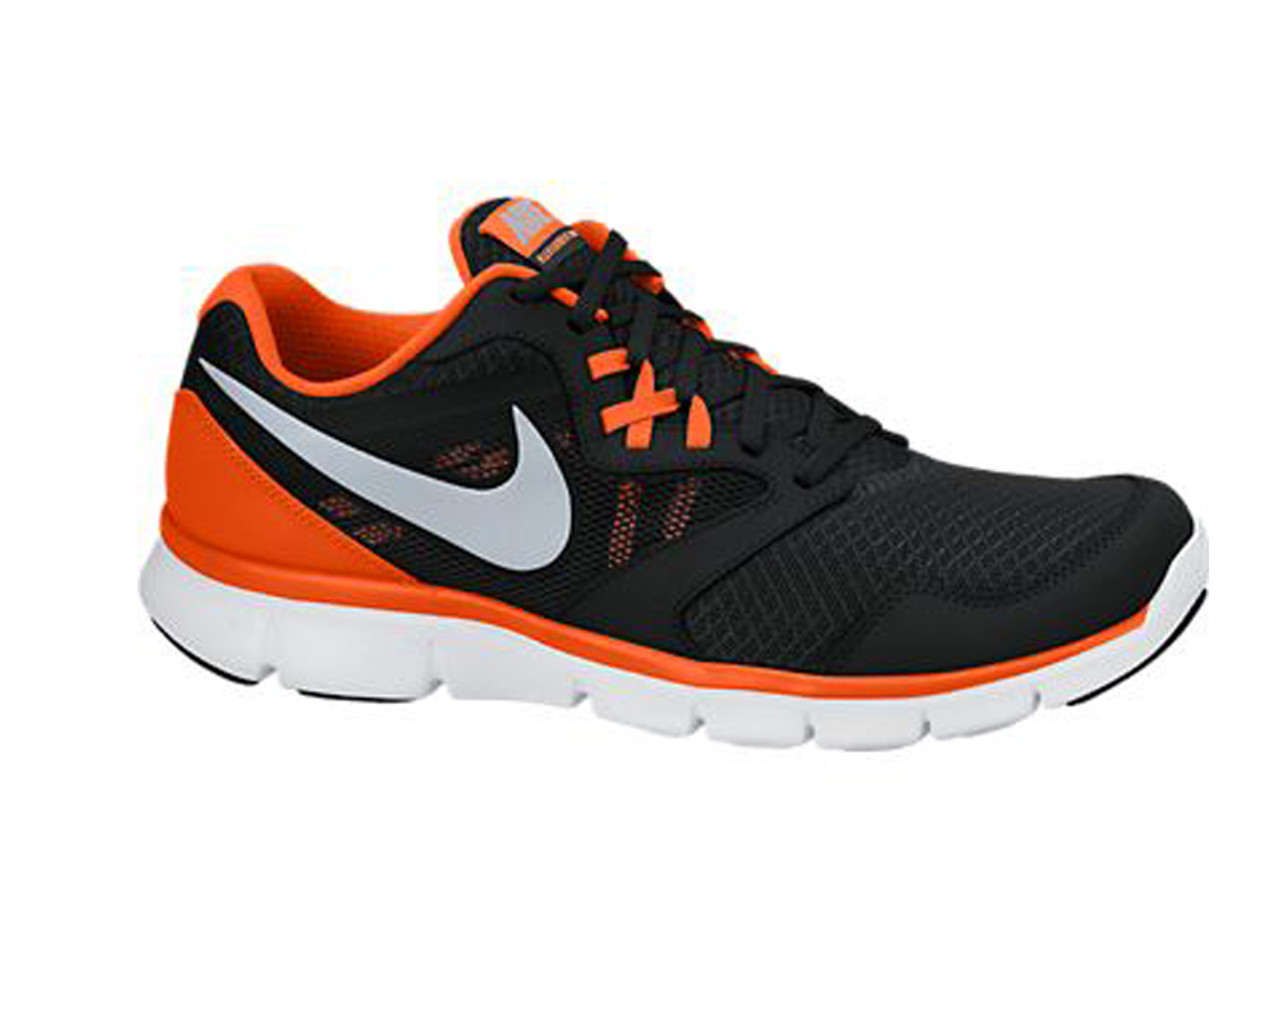 5a5fe38ab459 Nike Men s Flex Experience Run 3 Running Shoes Black Team Orange - Shop now